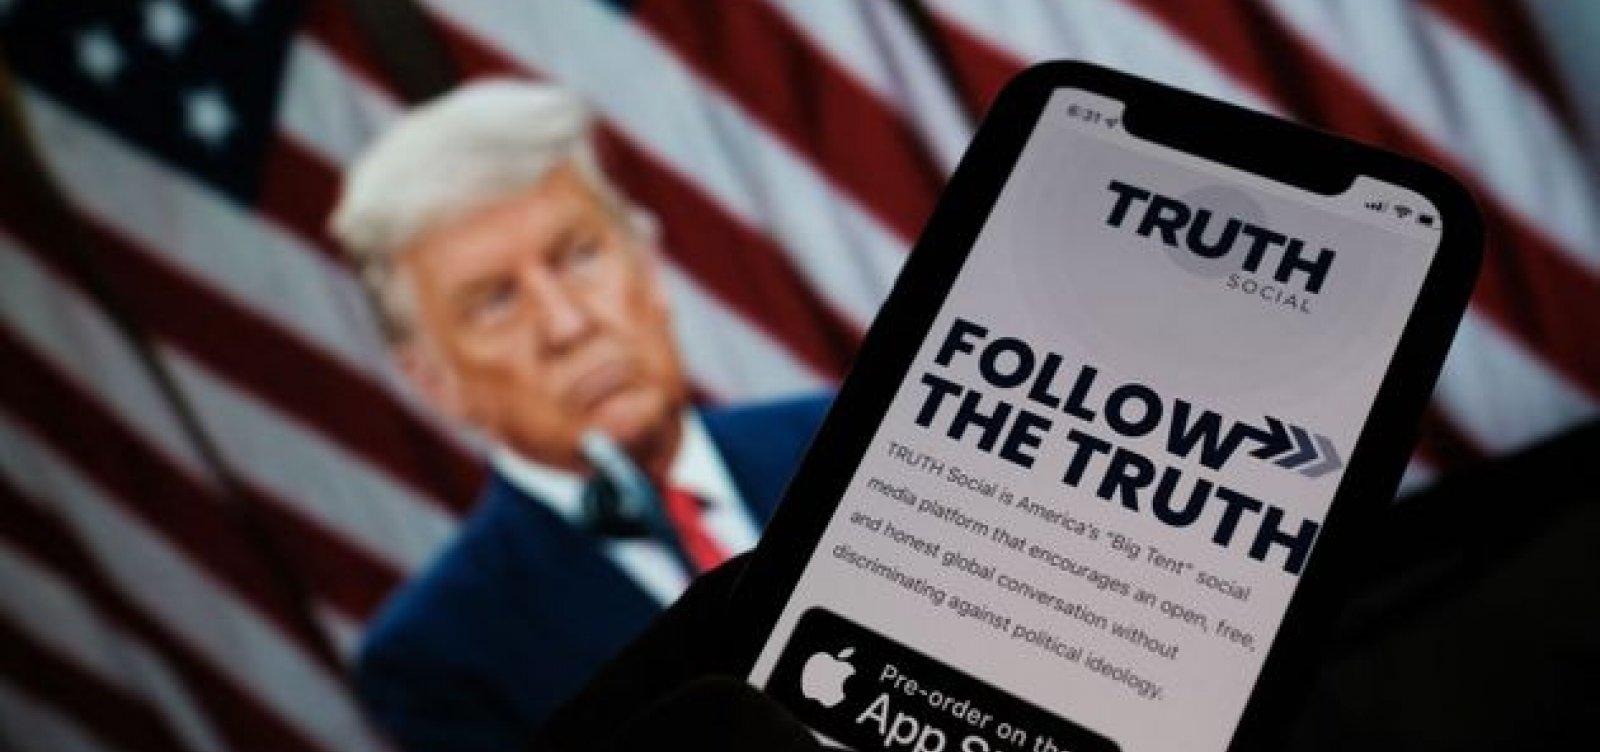 Trump anuncia lançamento de sua rede social após ser expulso do Twitter e Facebook